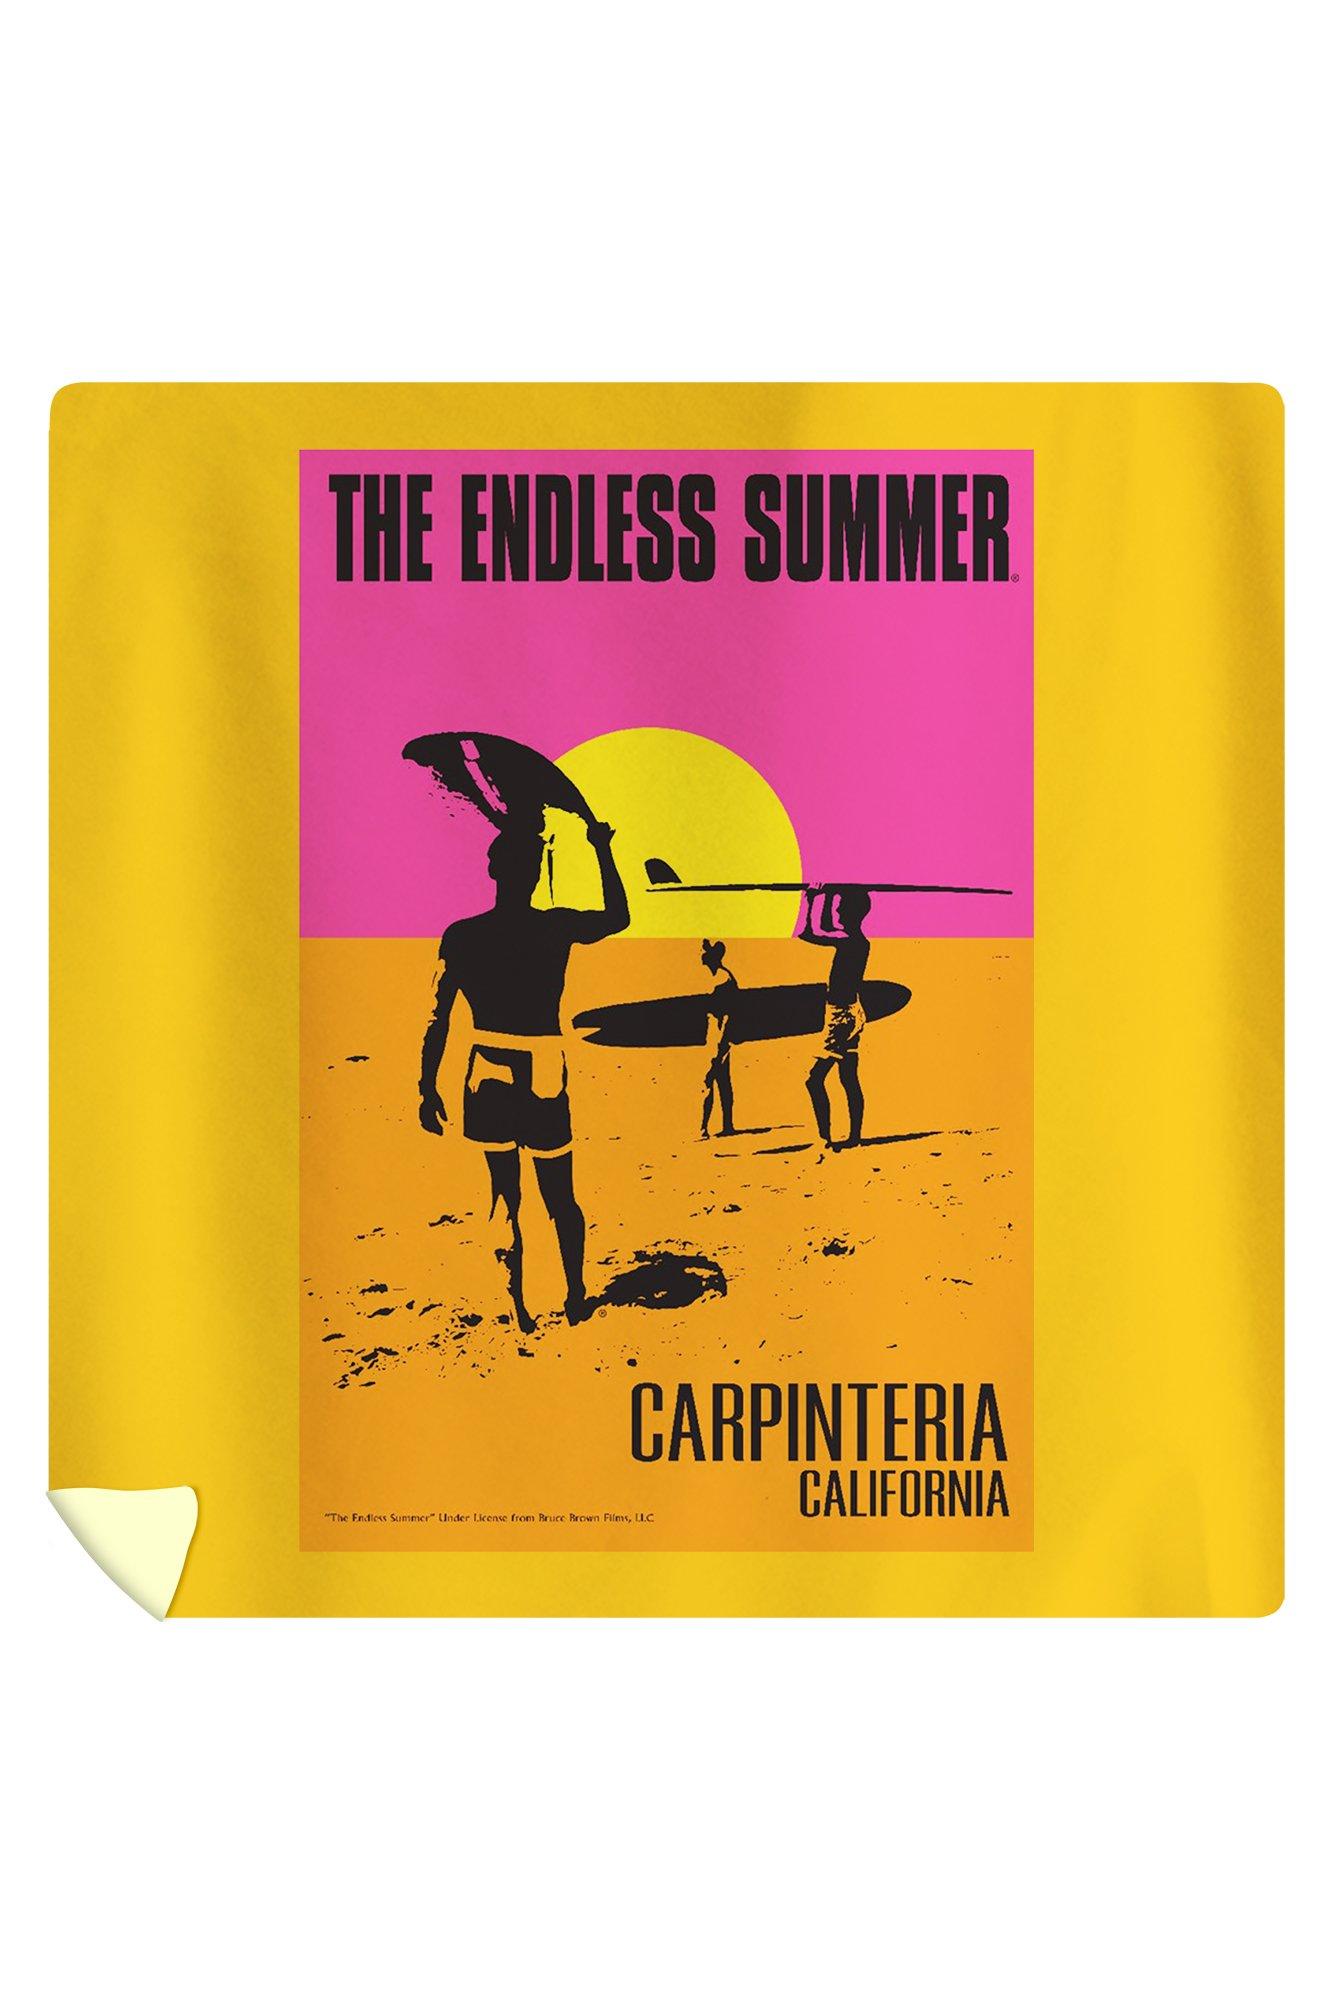 Carpinteria, California - The Endless Summer - Original Movie Poster (88x88 Queen Microfiber Duvet Cover)